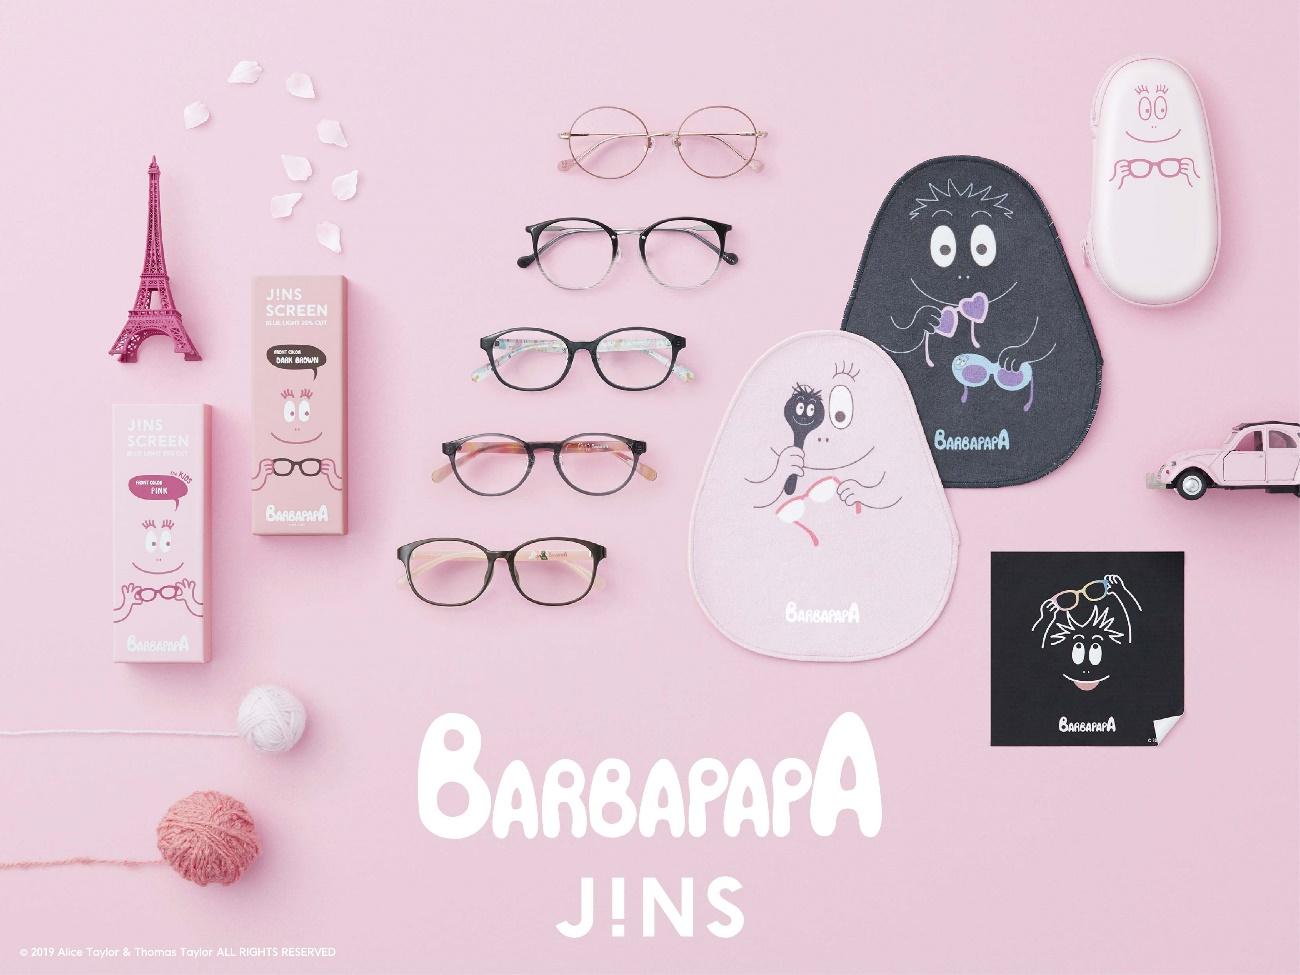 【JINS】世界的に愛される「BARBAPAPA(バーバパパ)」とJINSがコラボレーション!